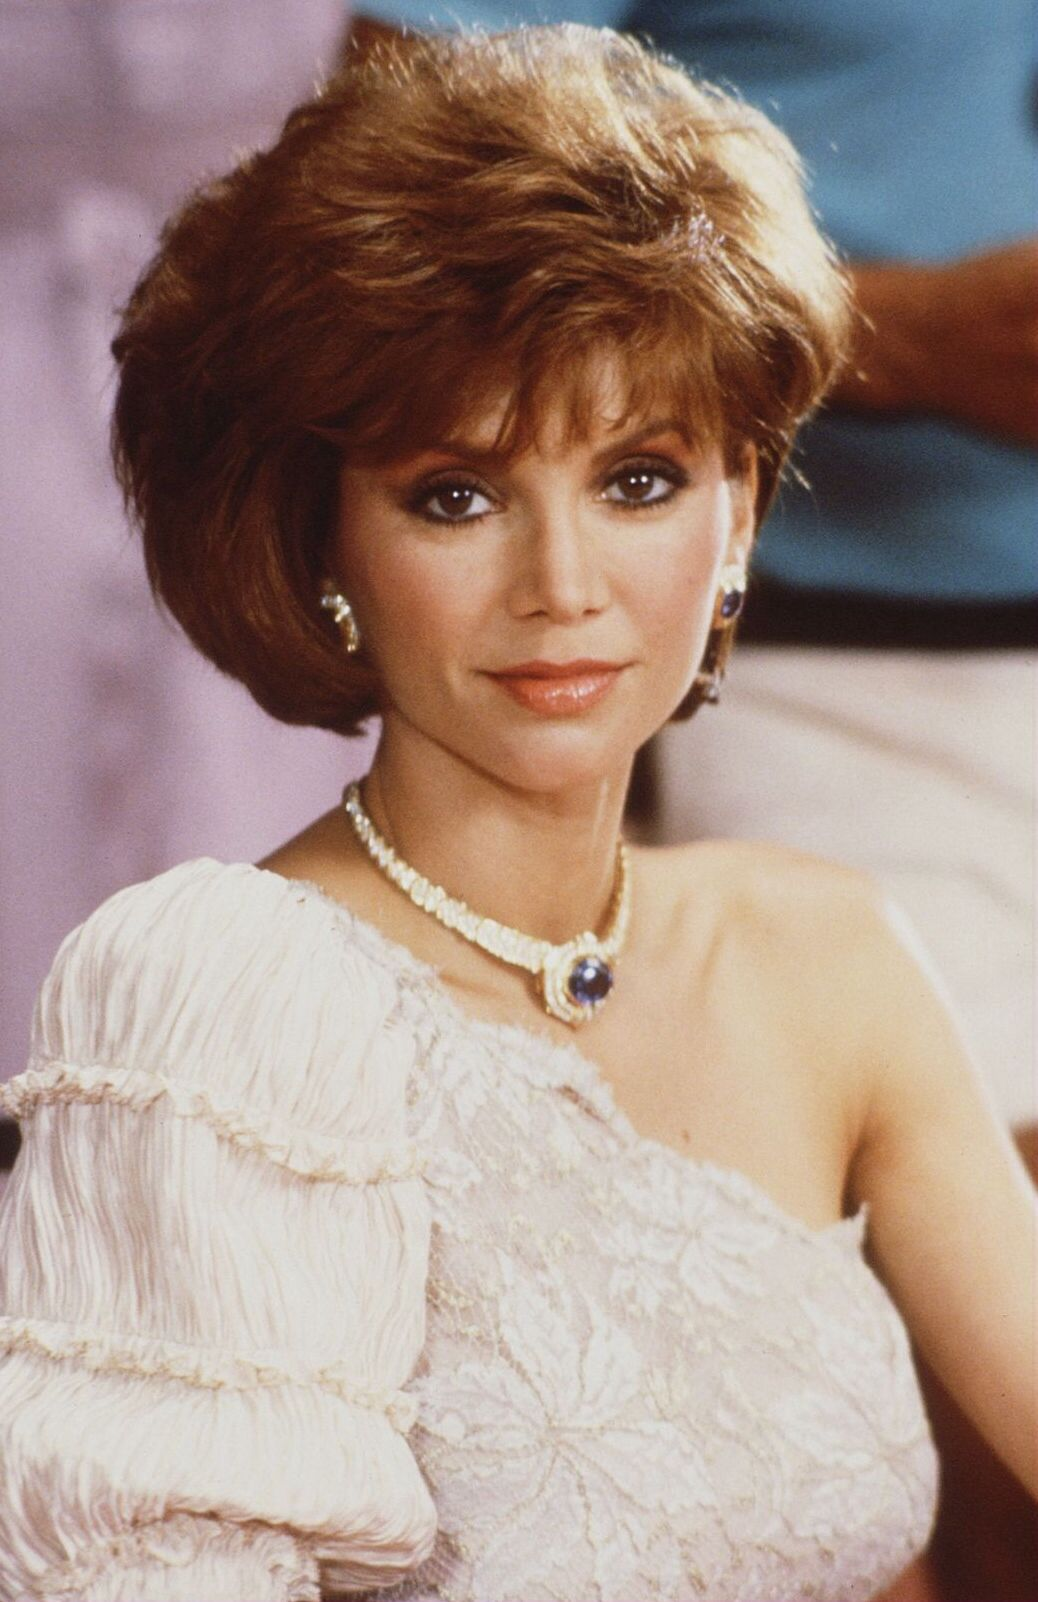 Dallas Beauty Lifestyle Fashion Blog: Victoria Principal, Pam Ewing.